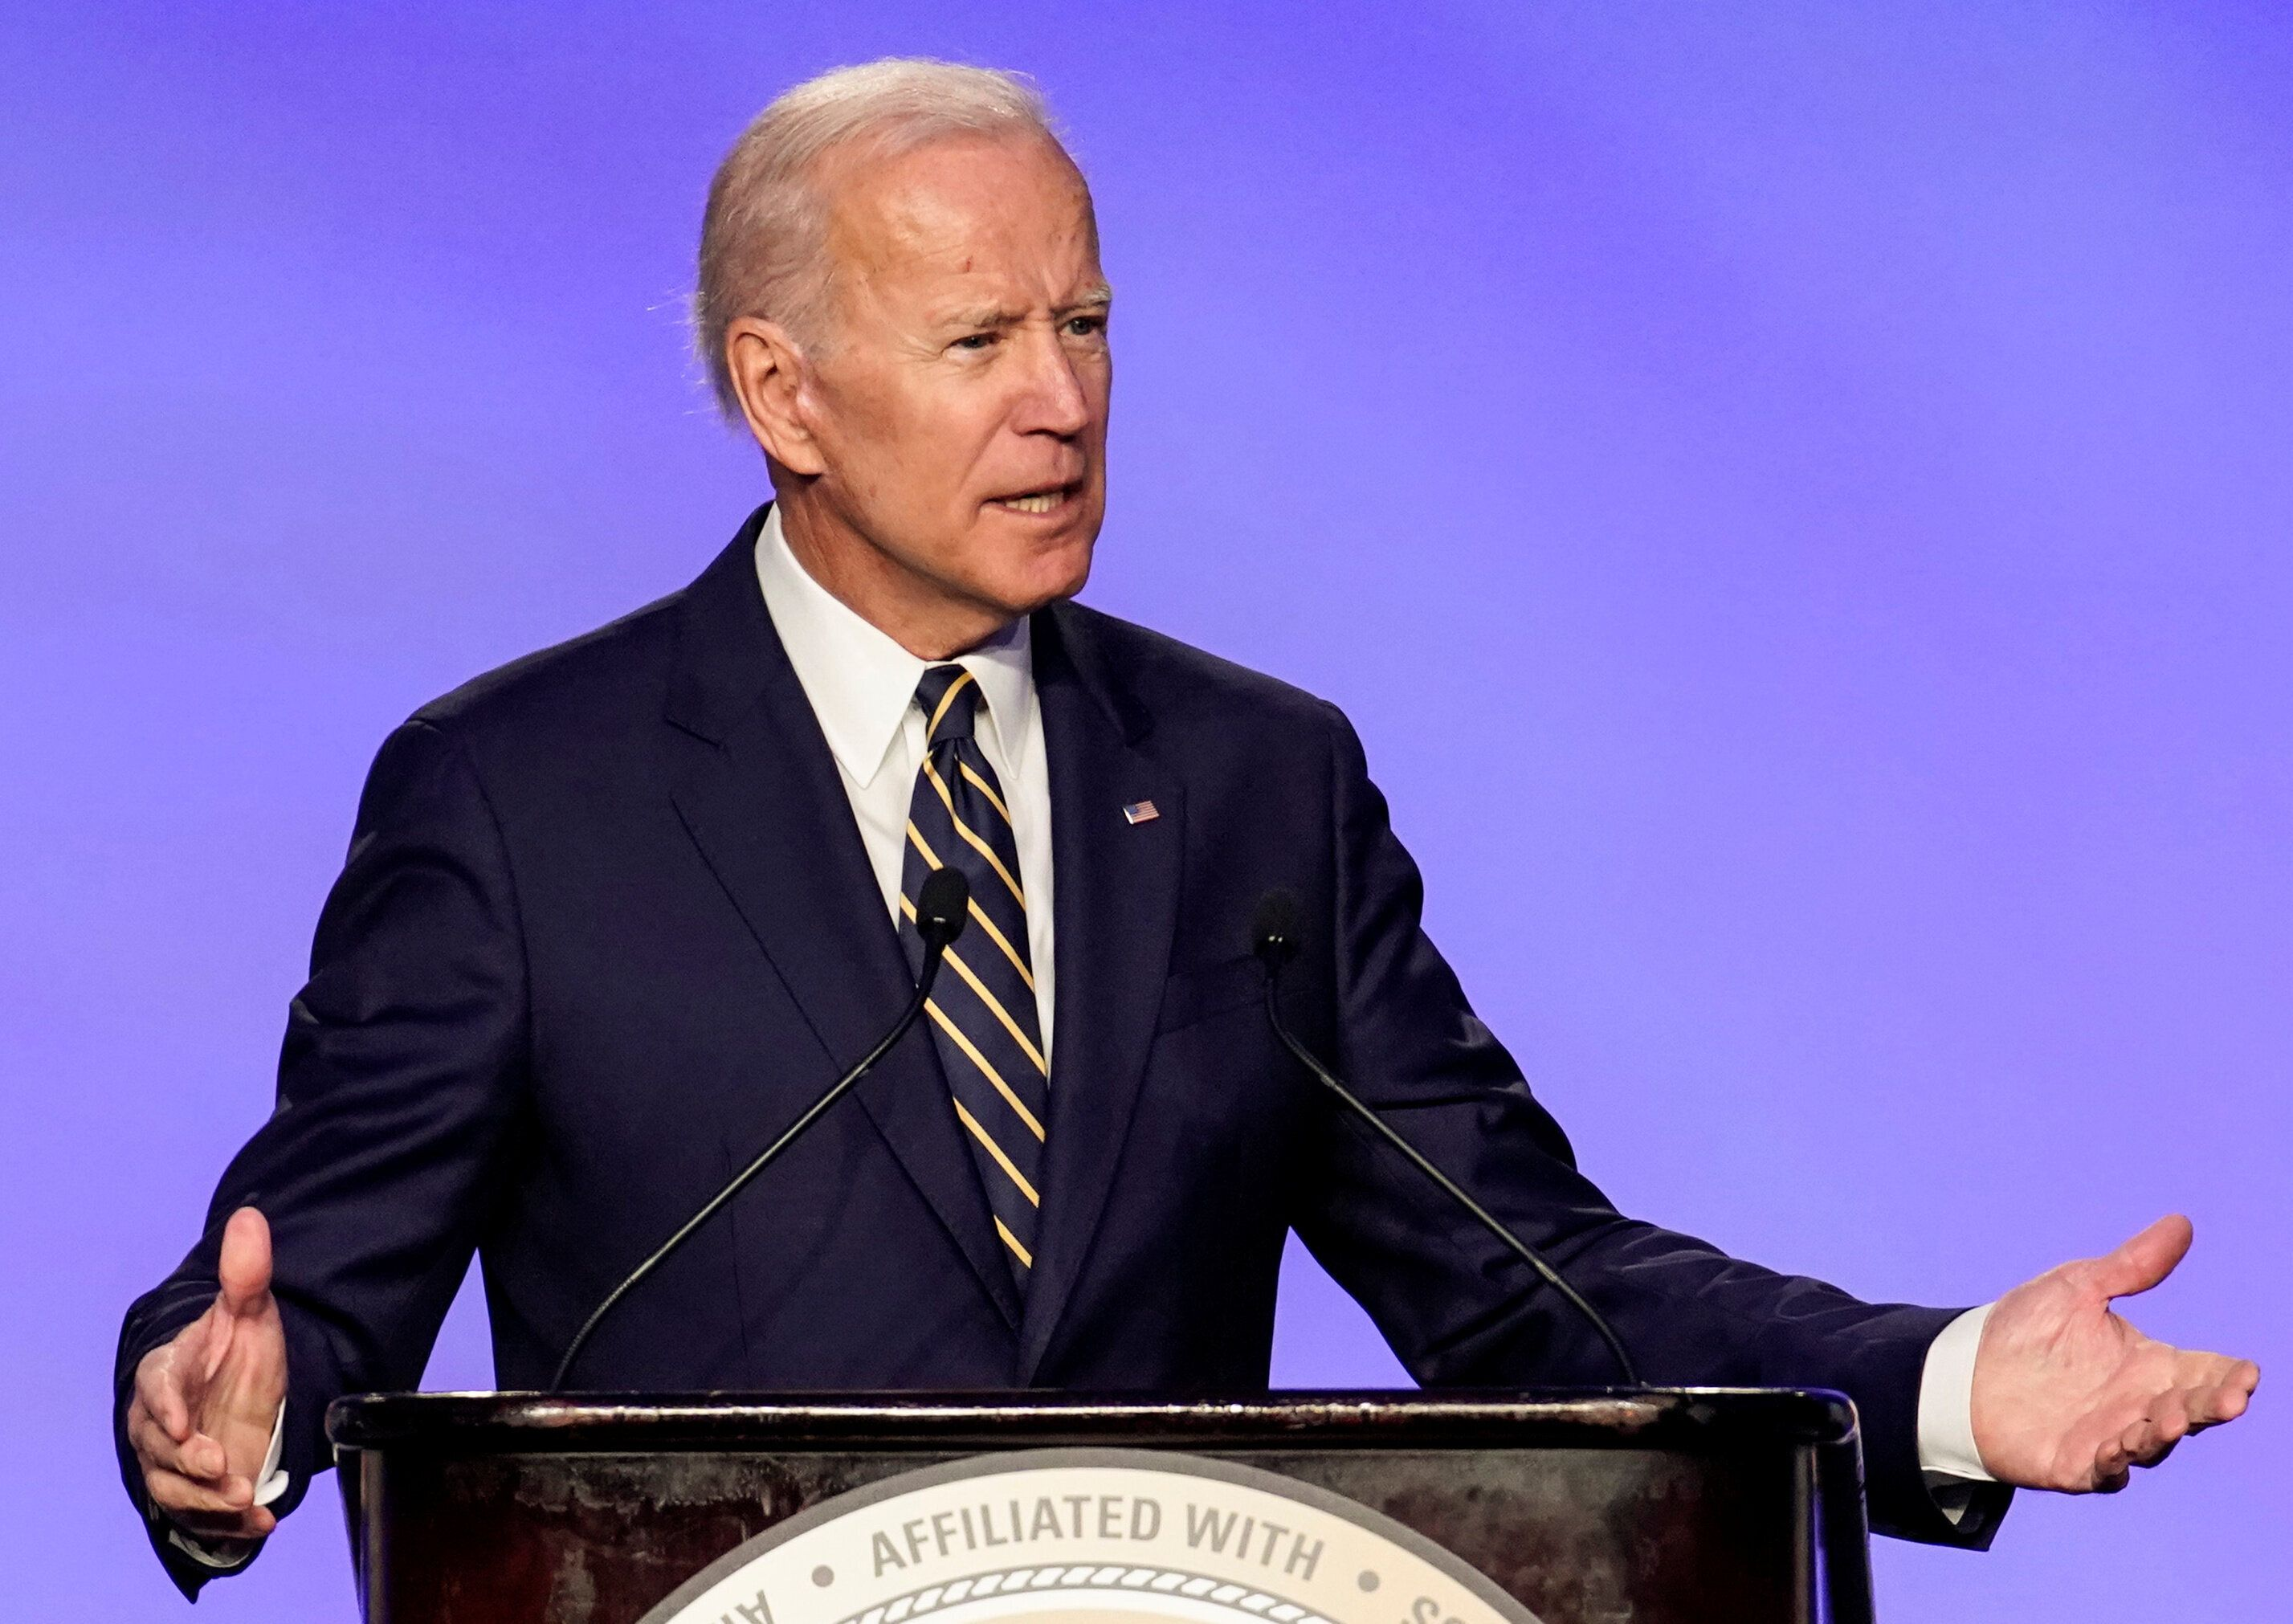 Joe Biden's First 24 Hours Foreshadow Some Tough Battles In 2020 Race